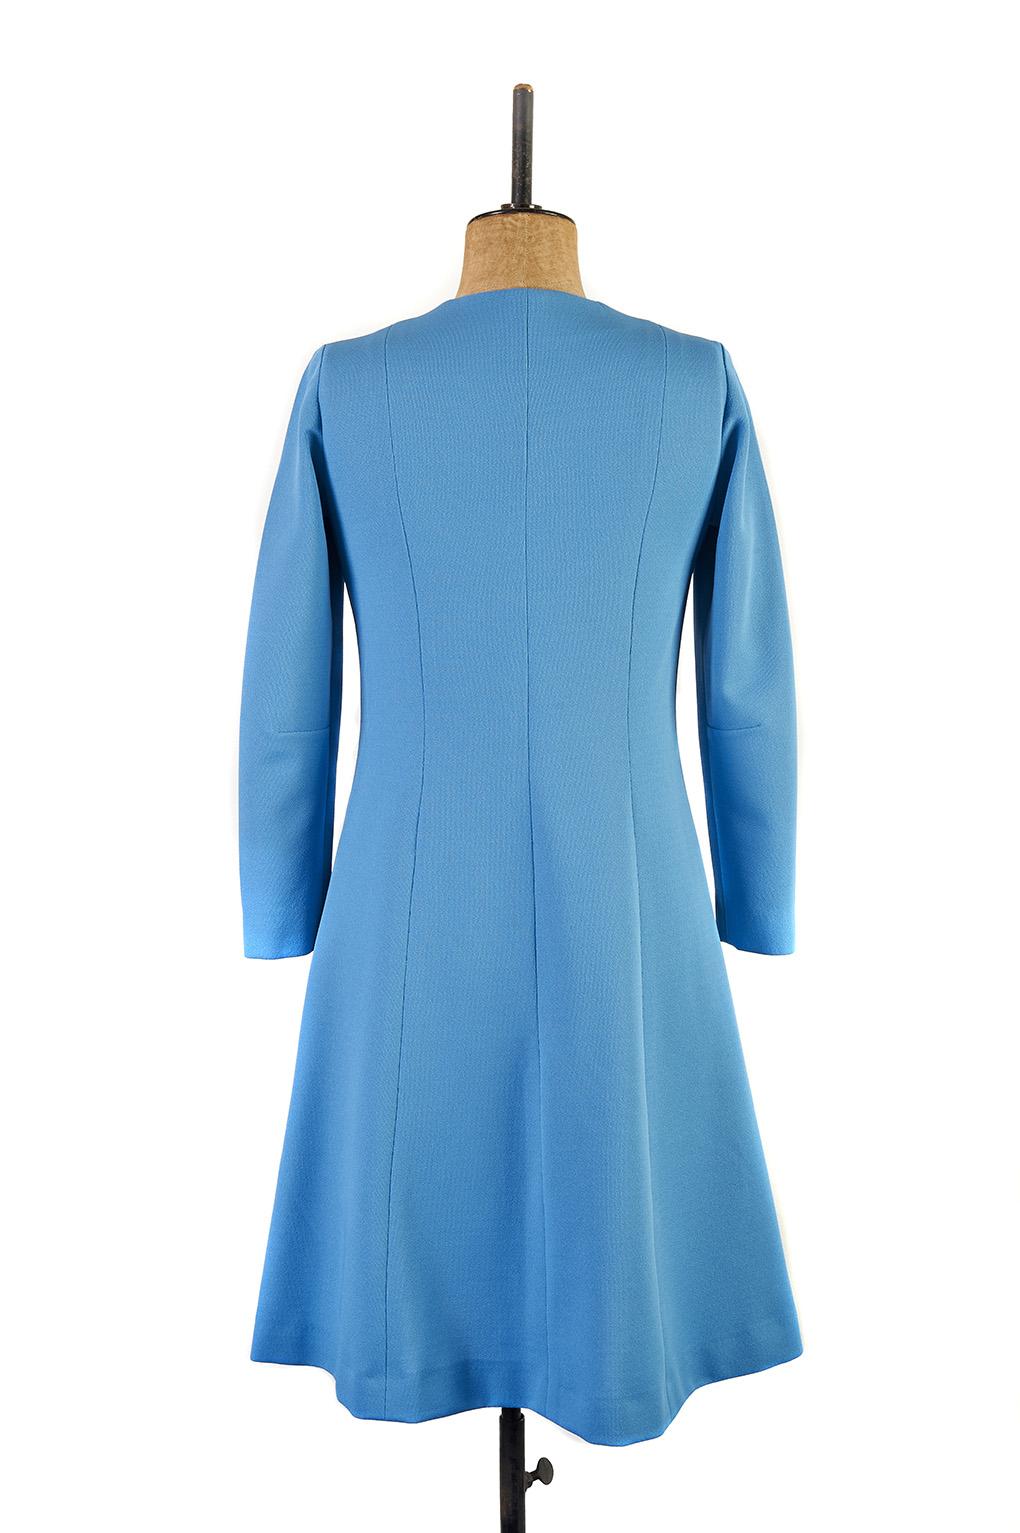 Blue Day Dress c.1970